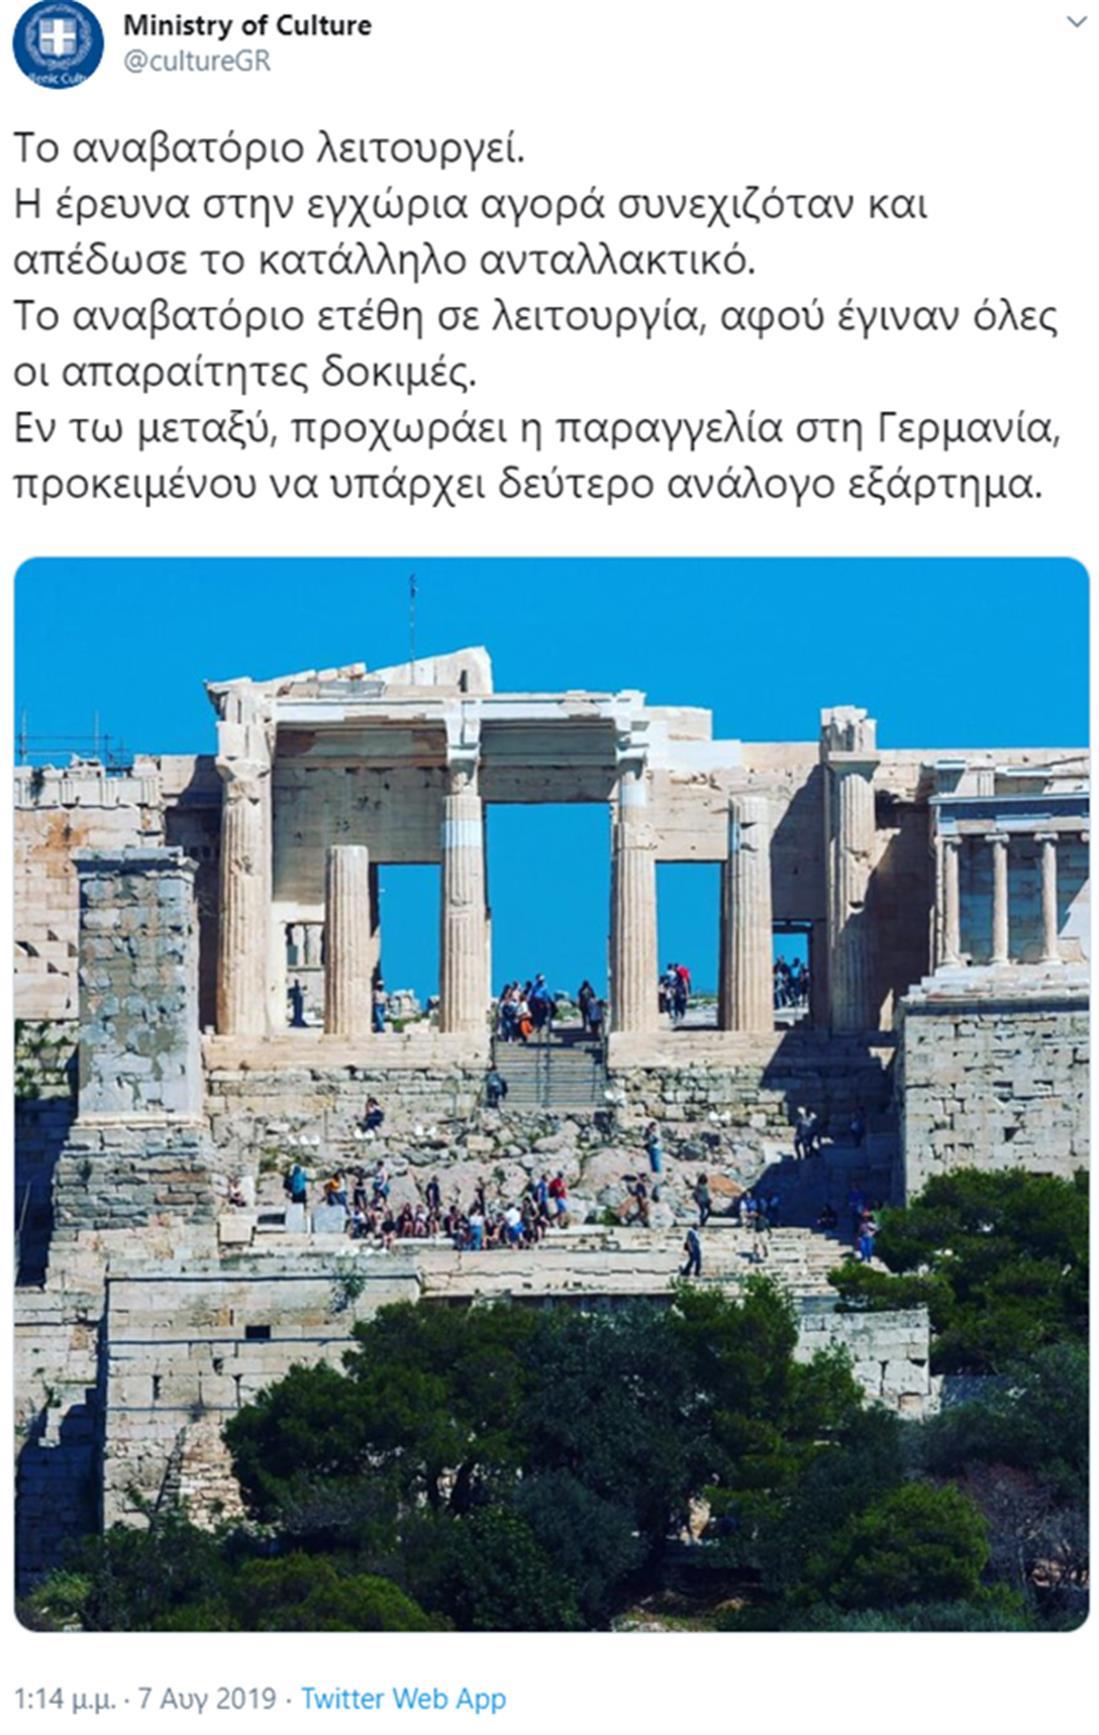 tweet - Υπουργείο Πολιτισμού -  αναβατόριο - Ακρόπολη - ανταλλακτικό